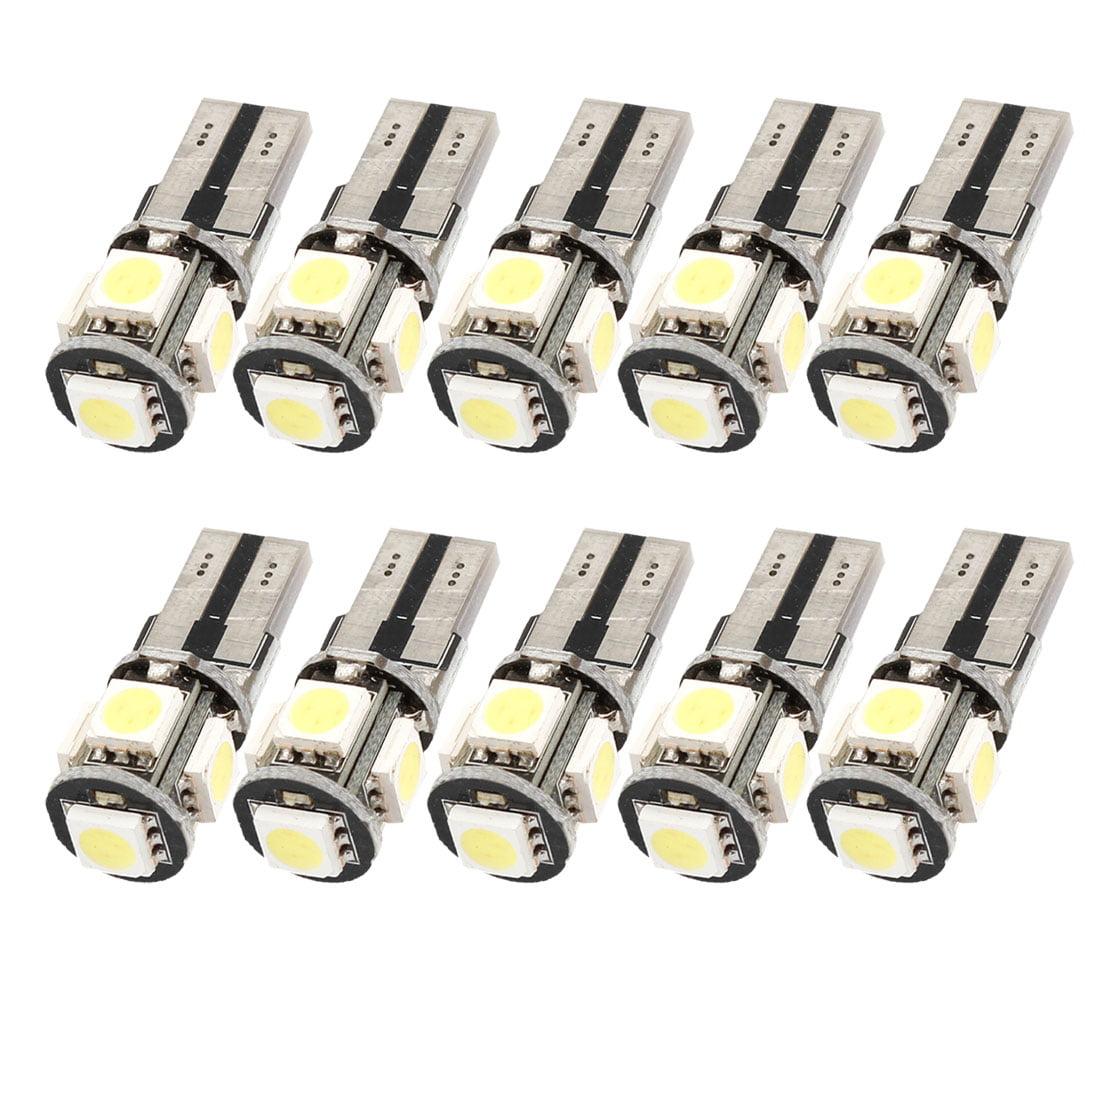 Unique Bargains 10 Pcs Canbus NO Error Free T10 5 SMD 5050  SIDE TAIL Light bulbs White